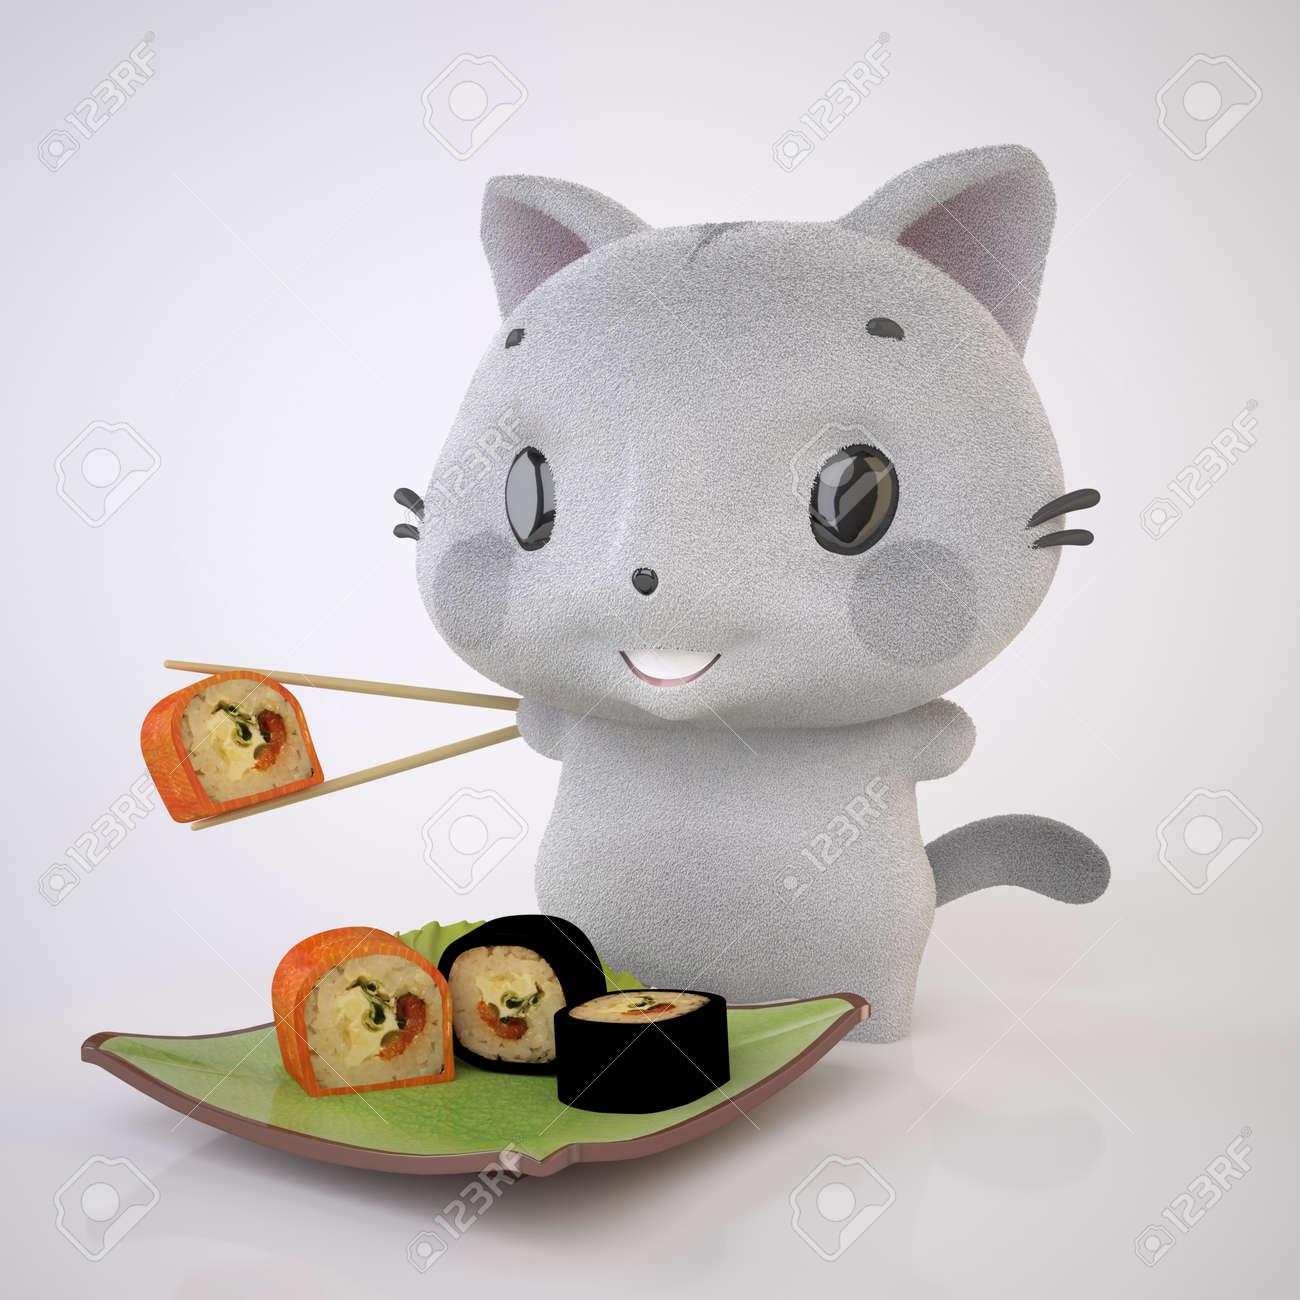 The Three-dimensional Grey kitten enjoys Sushi Stock Photo - 17337531